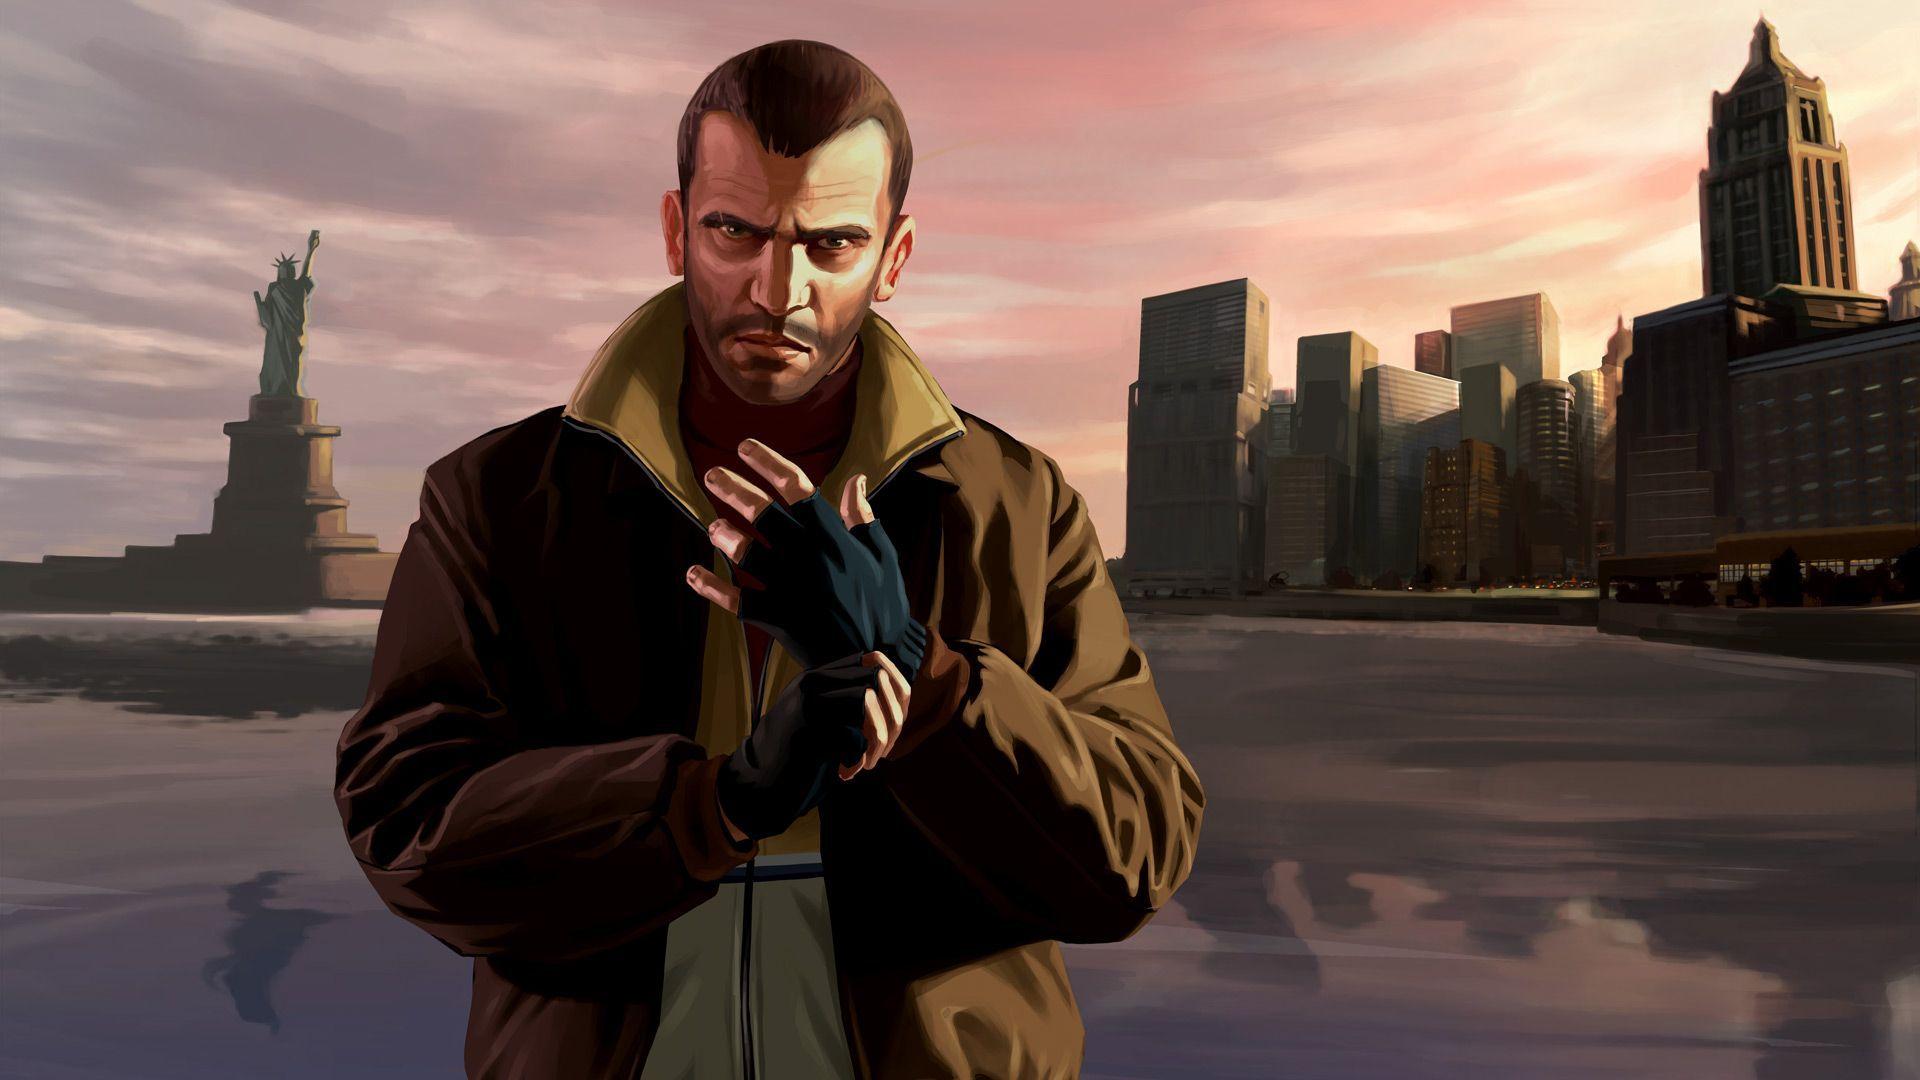 Niko Bellic   Grand Theft Auto IV wallpaper 16628 1920x1080